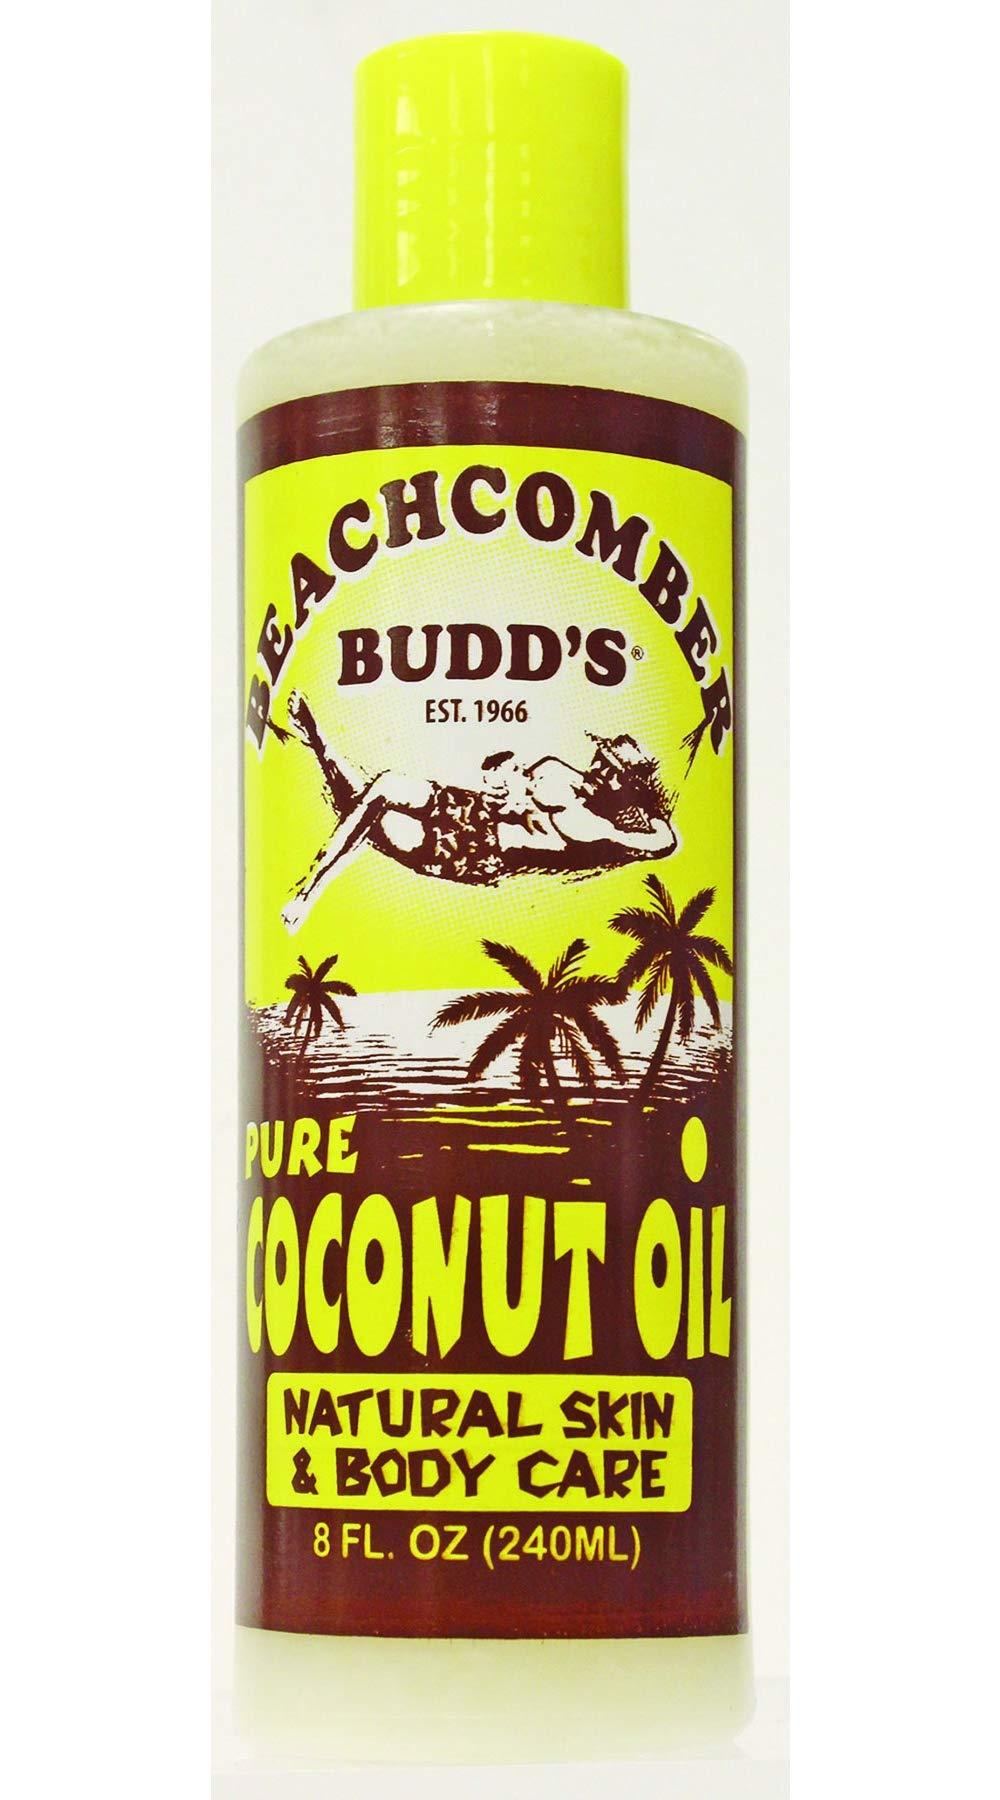 Value Pack Hawaiian Beachcomber Budd Pure Coconut Oil 8 oz. Scented 4 Bottles by Beachcomber Budd's